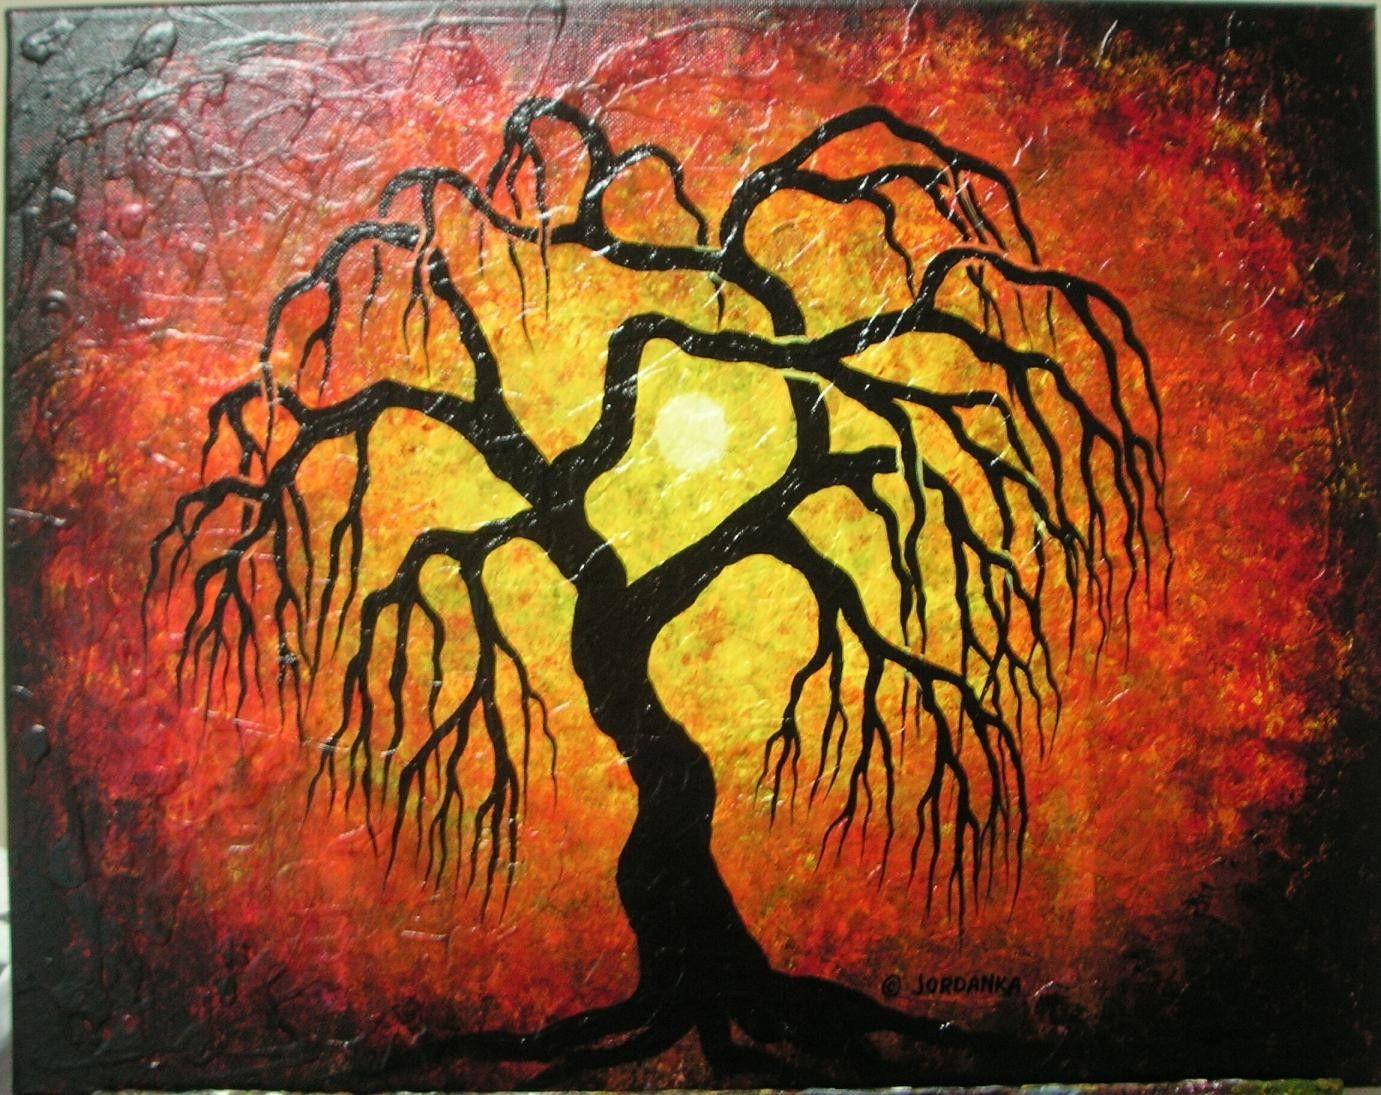 Weeping willow tree , Original painting by Jordanka | Willow tree ...